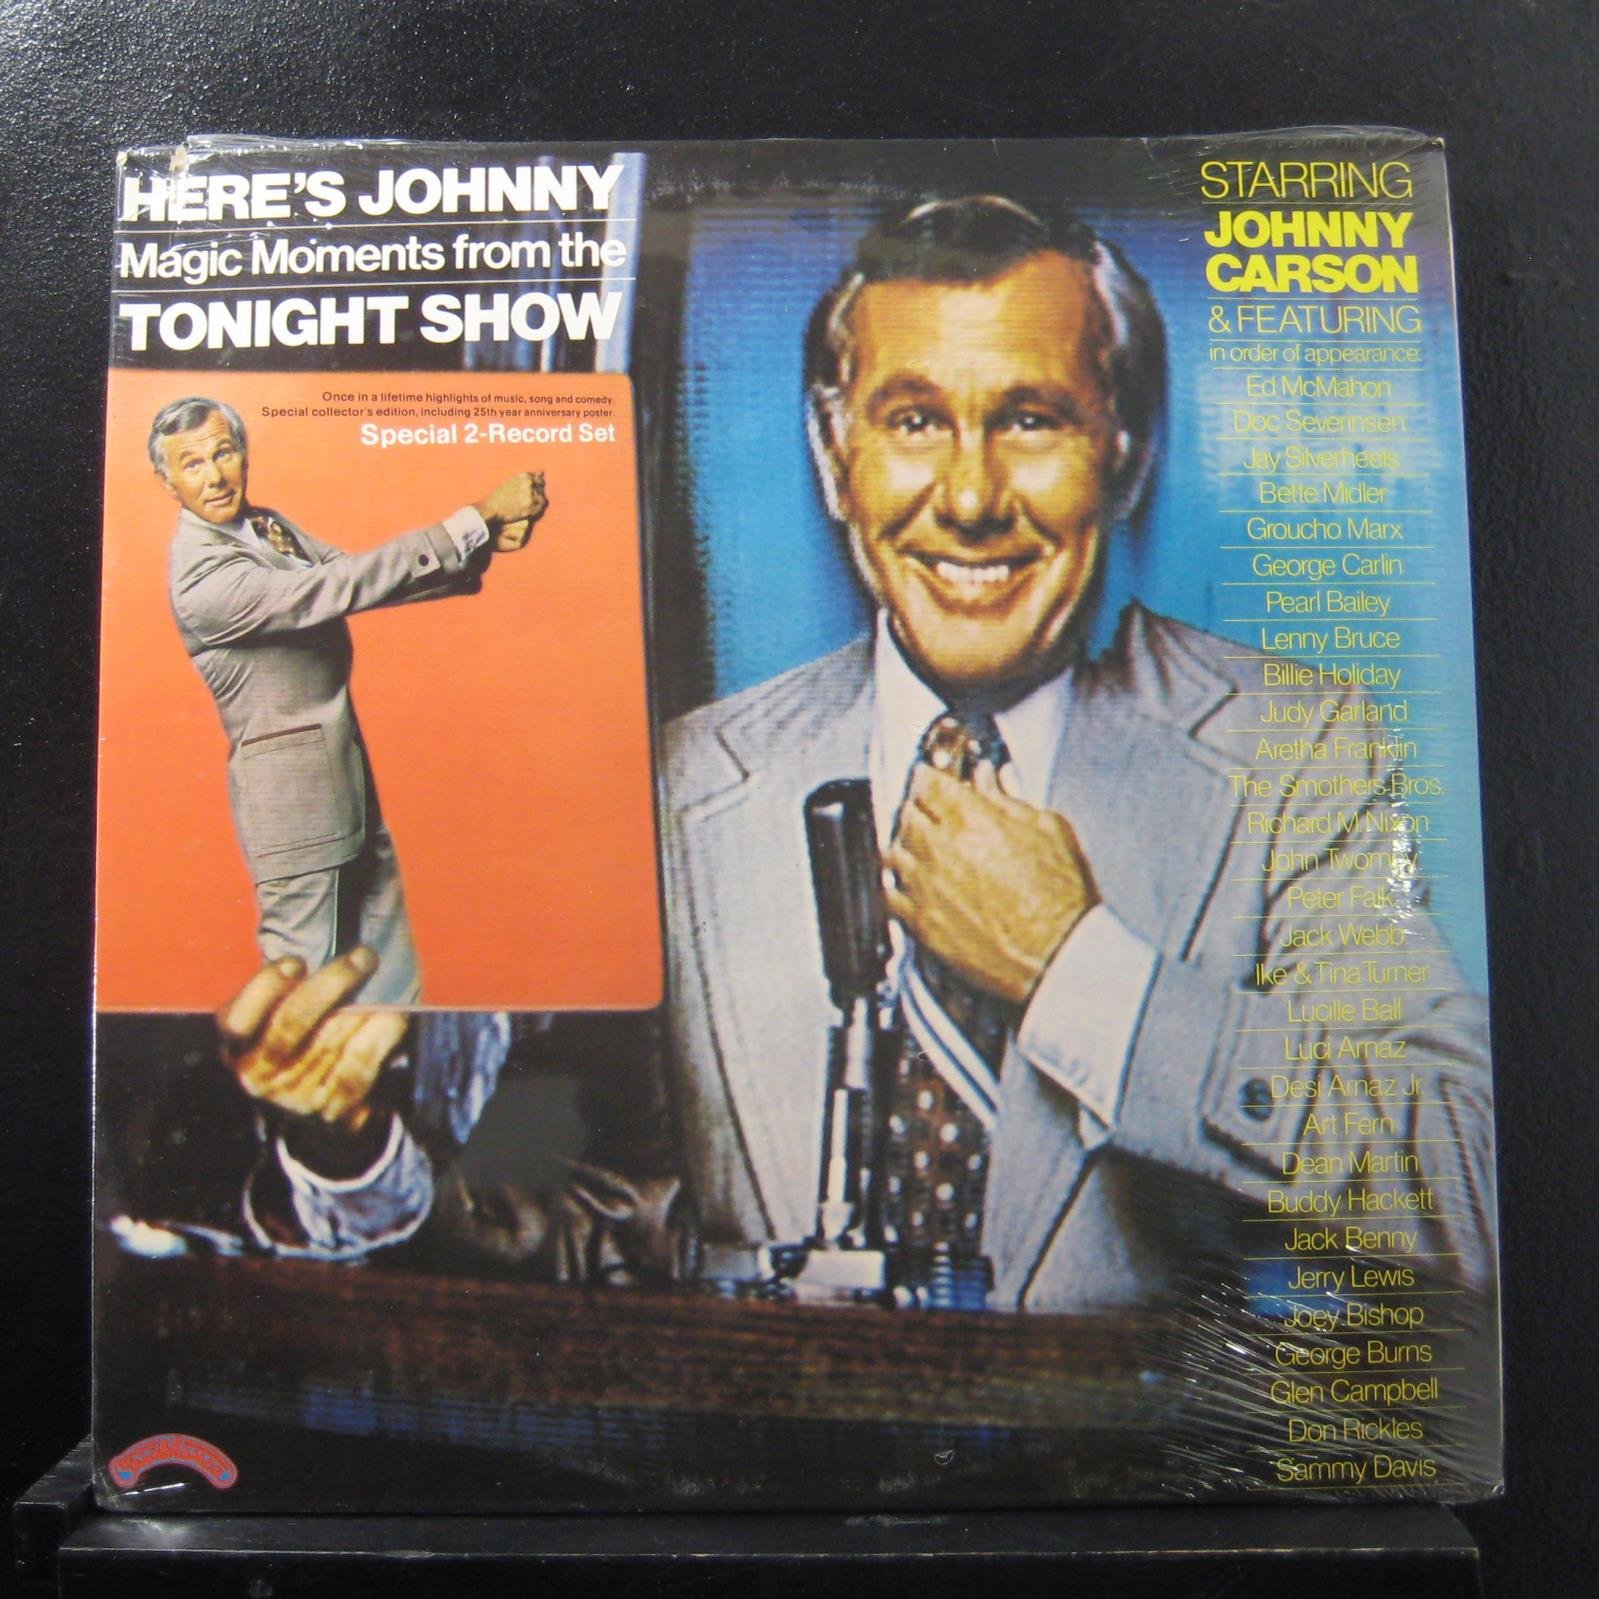 Vinilo : JOHNNY CARSON - Here's Johnny-magic Moments Tonight Show (original Soundtrack) (2PC)